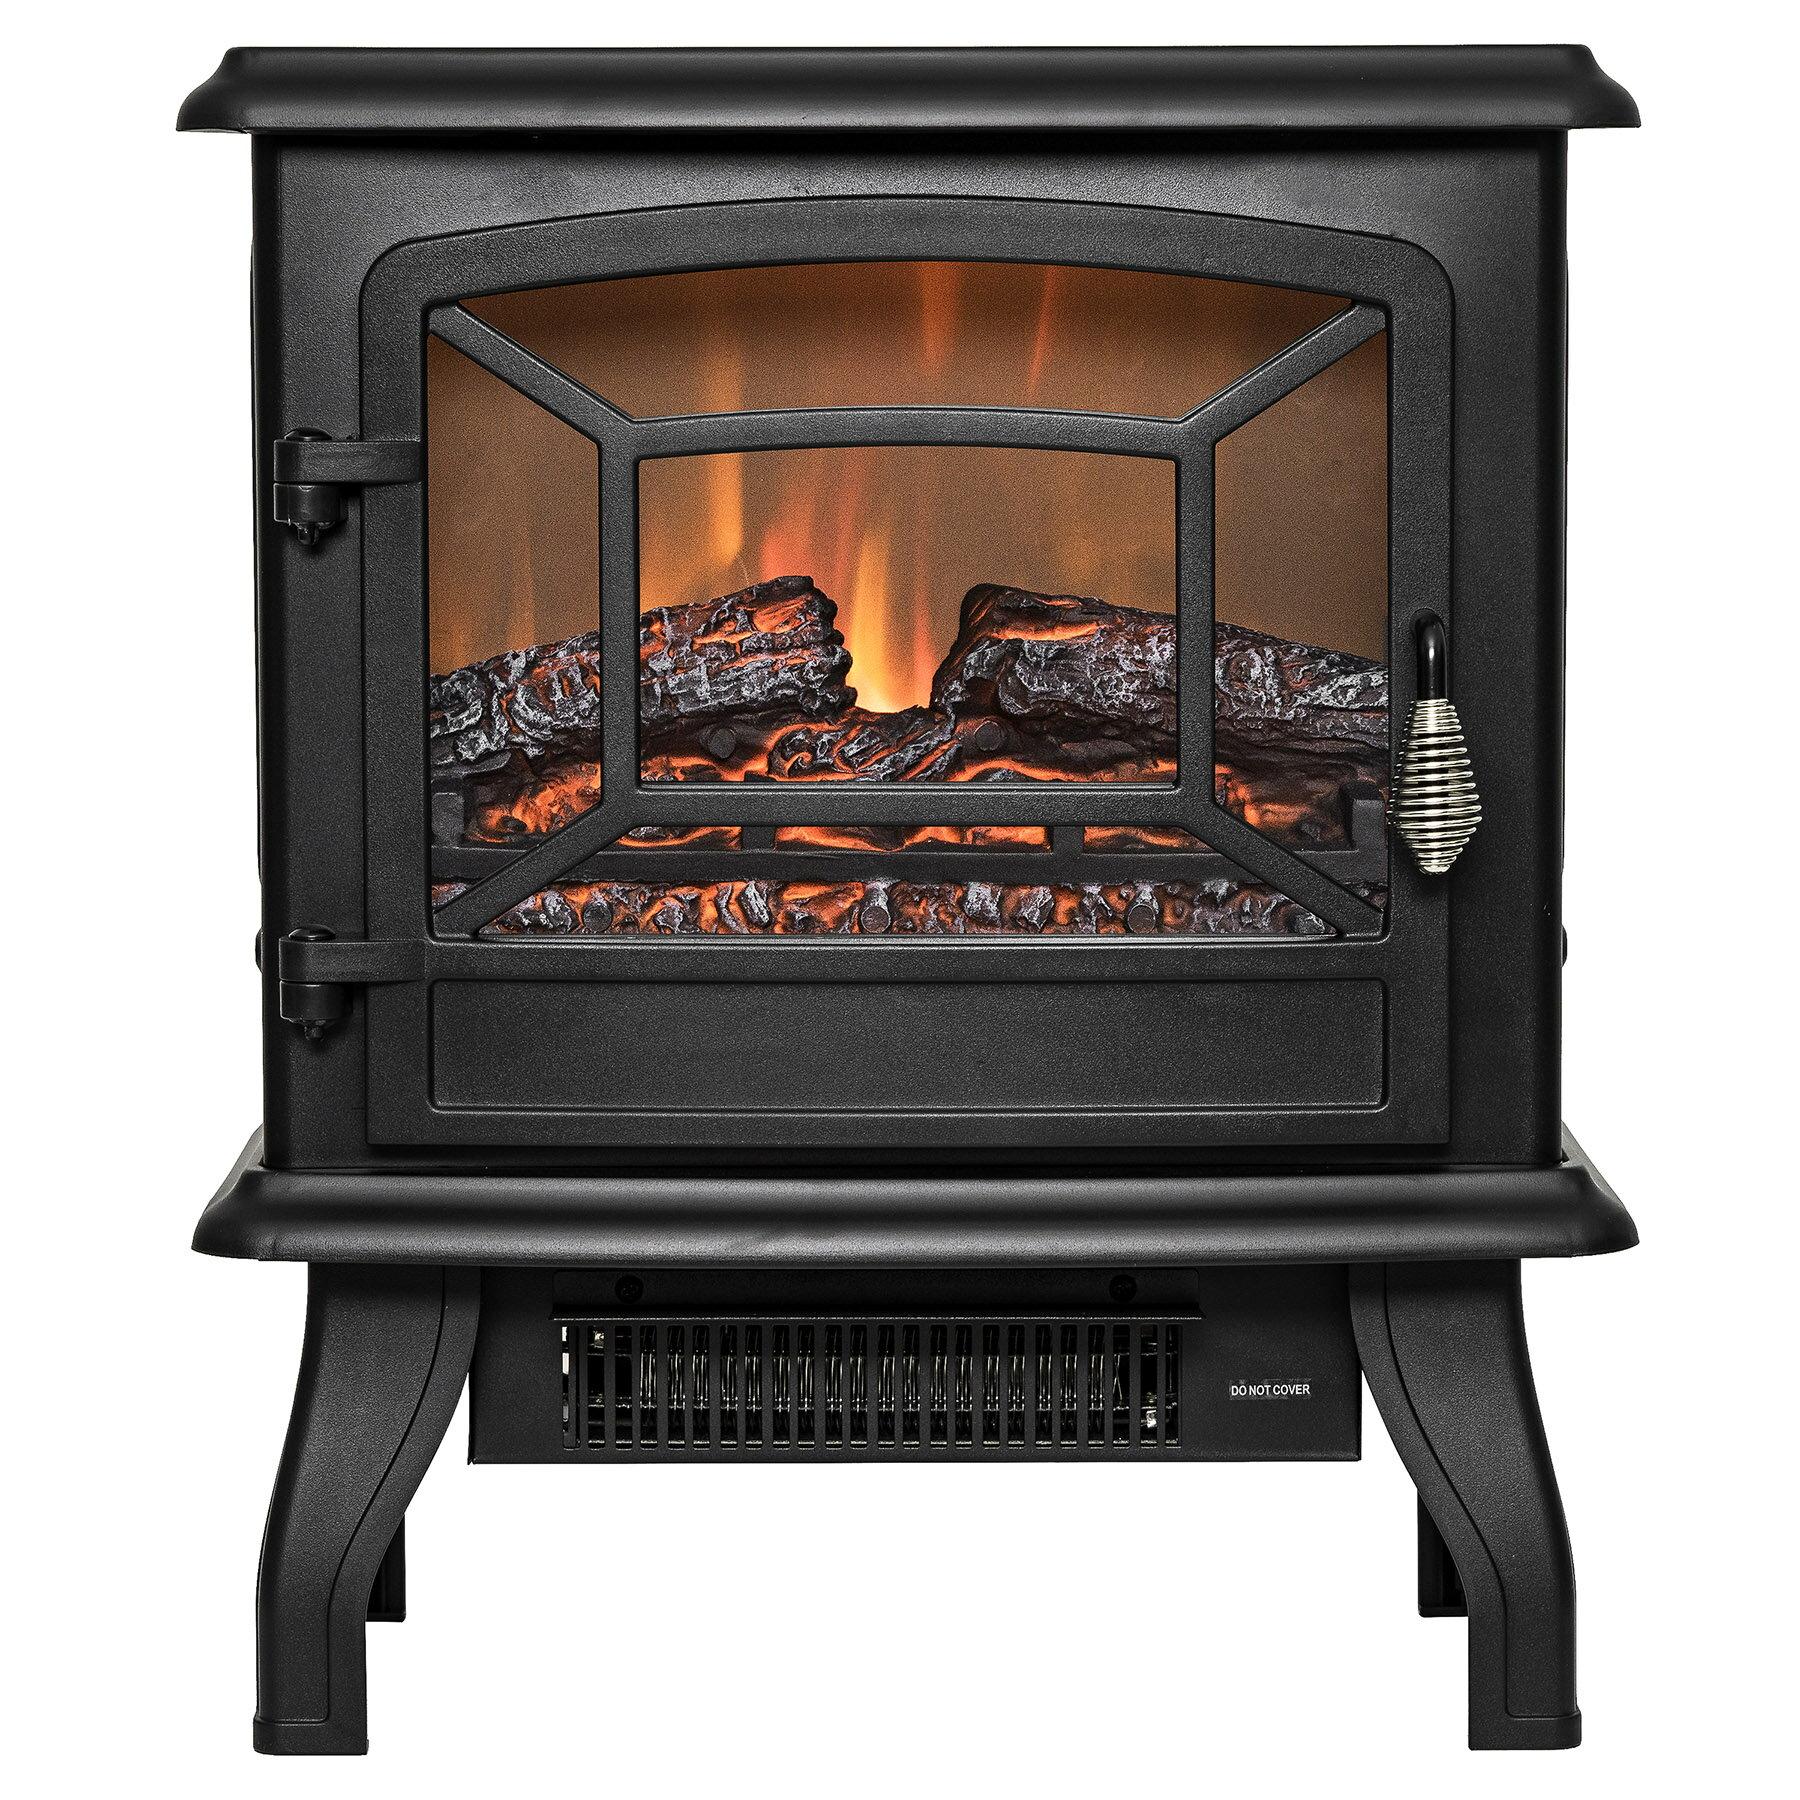 "AKDY 17"" Black Finish Freestanding Portable Electric Fireplace Heater 2 Setting Level 0"